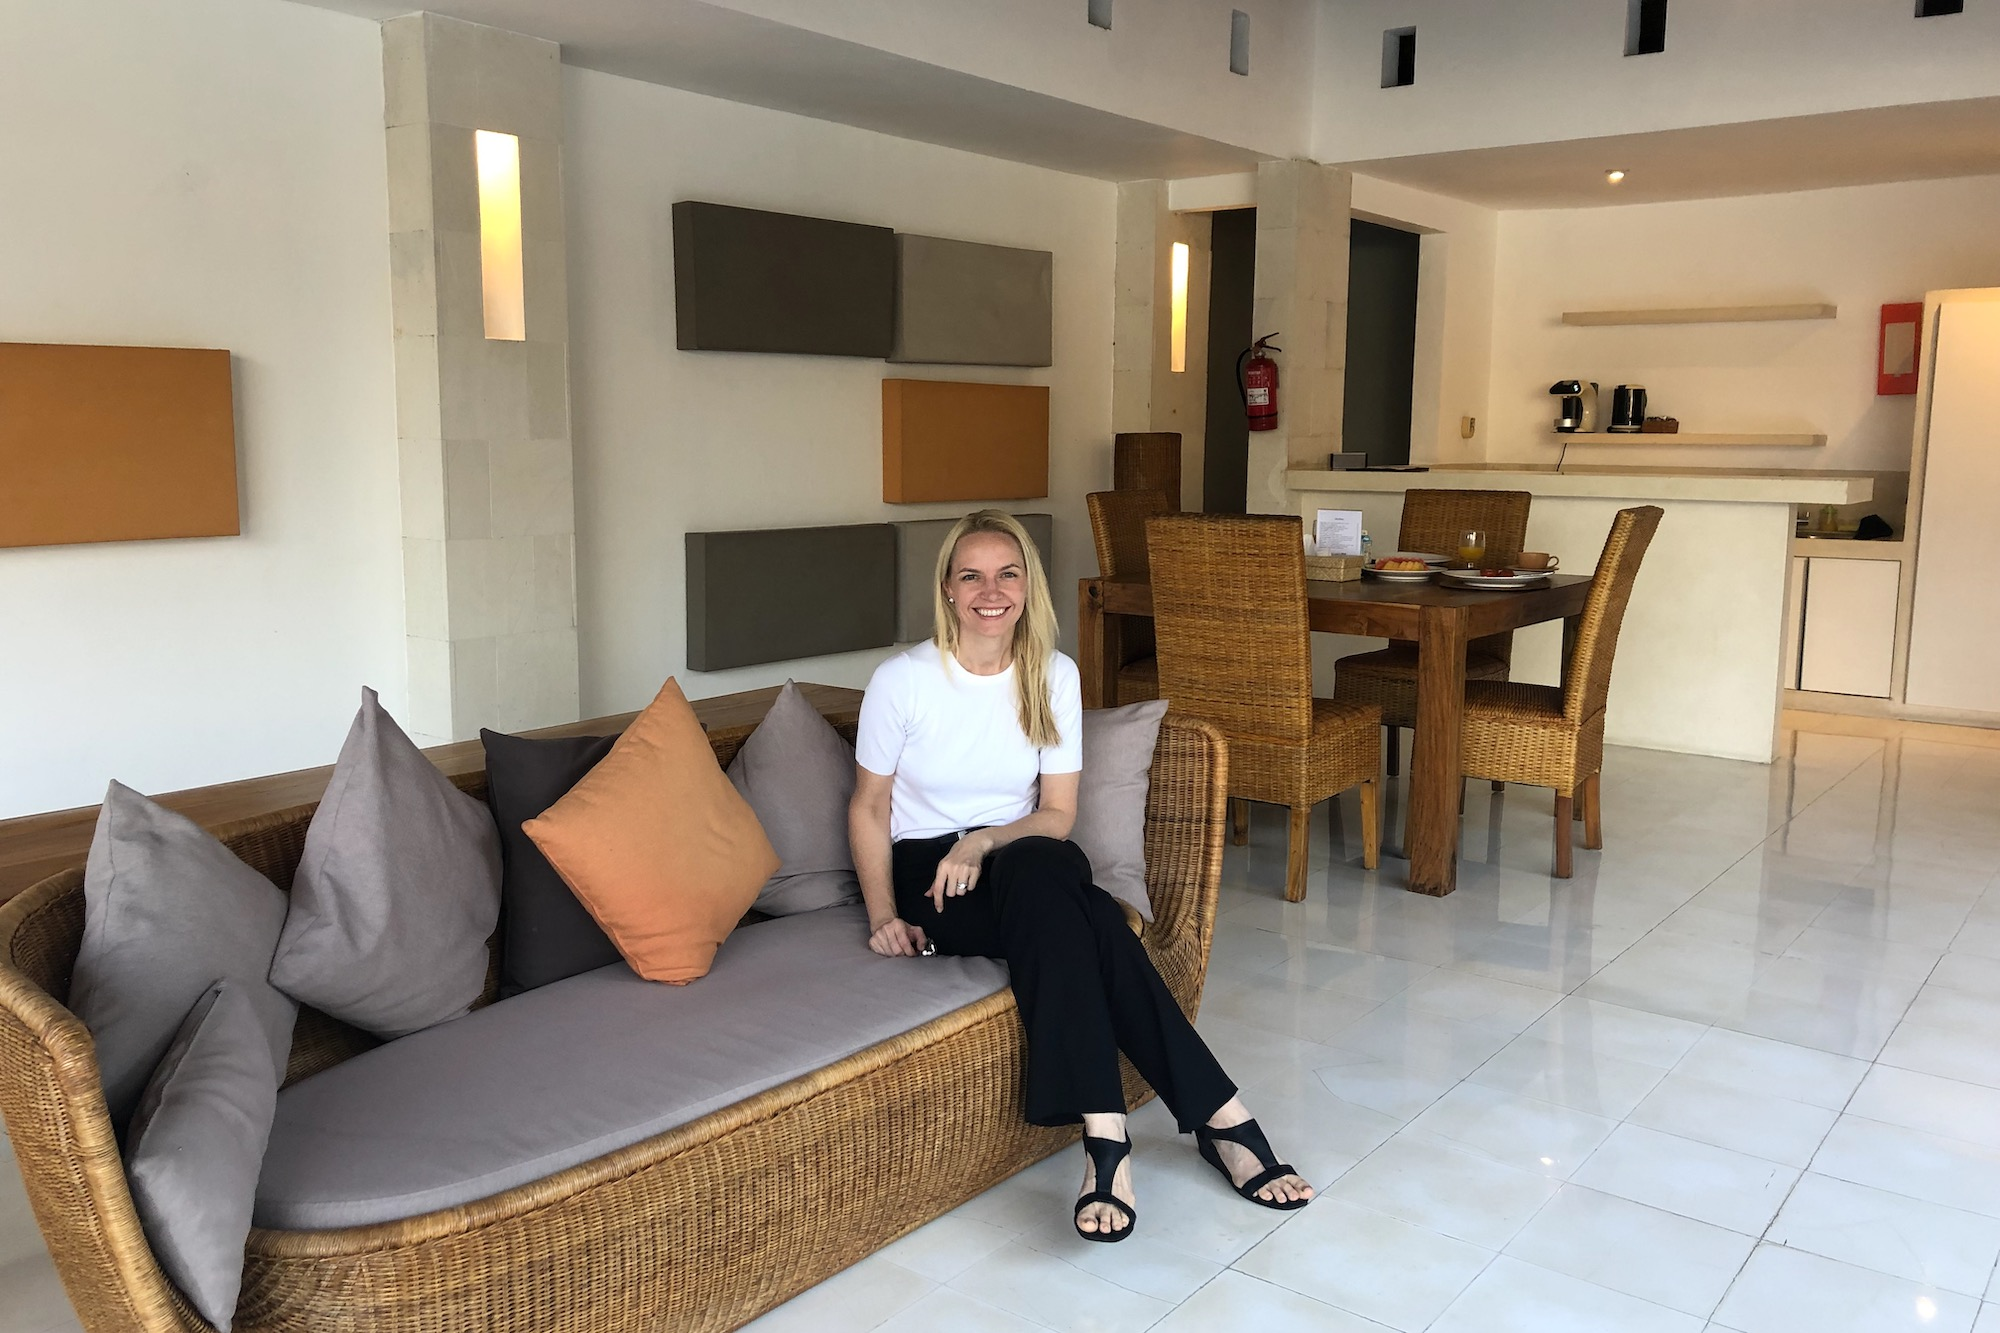 bvilla+spa – Sweet and Simple in Seminyak